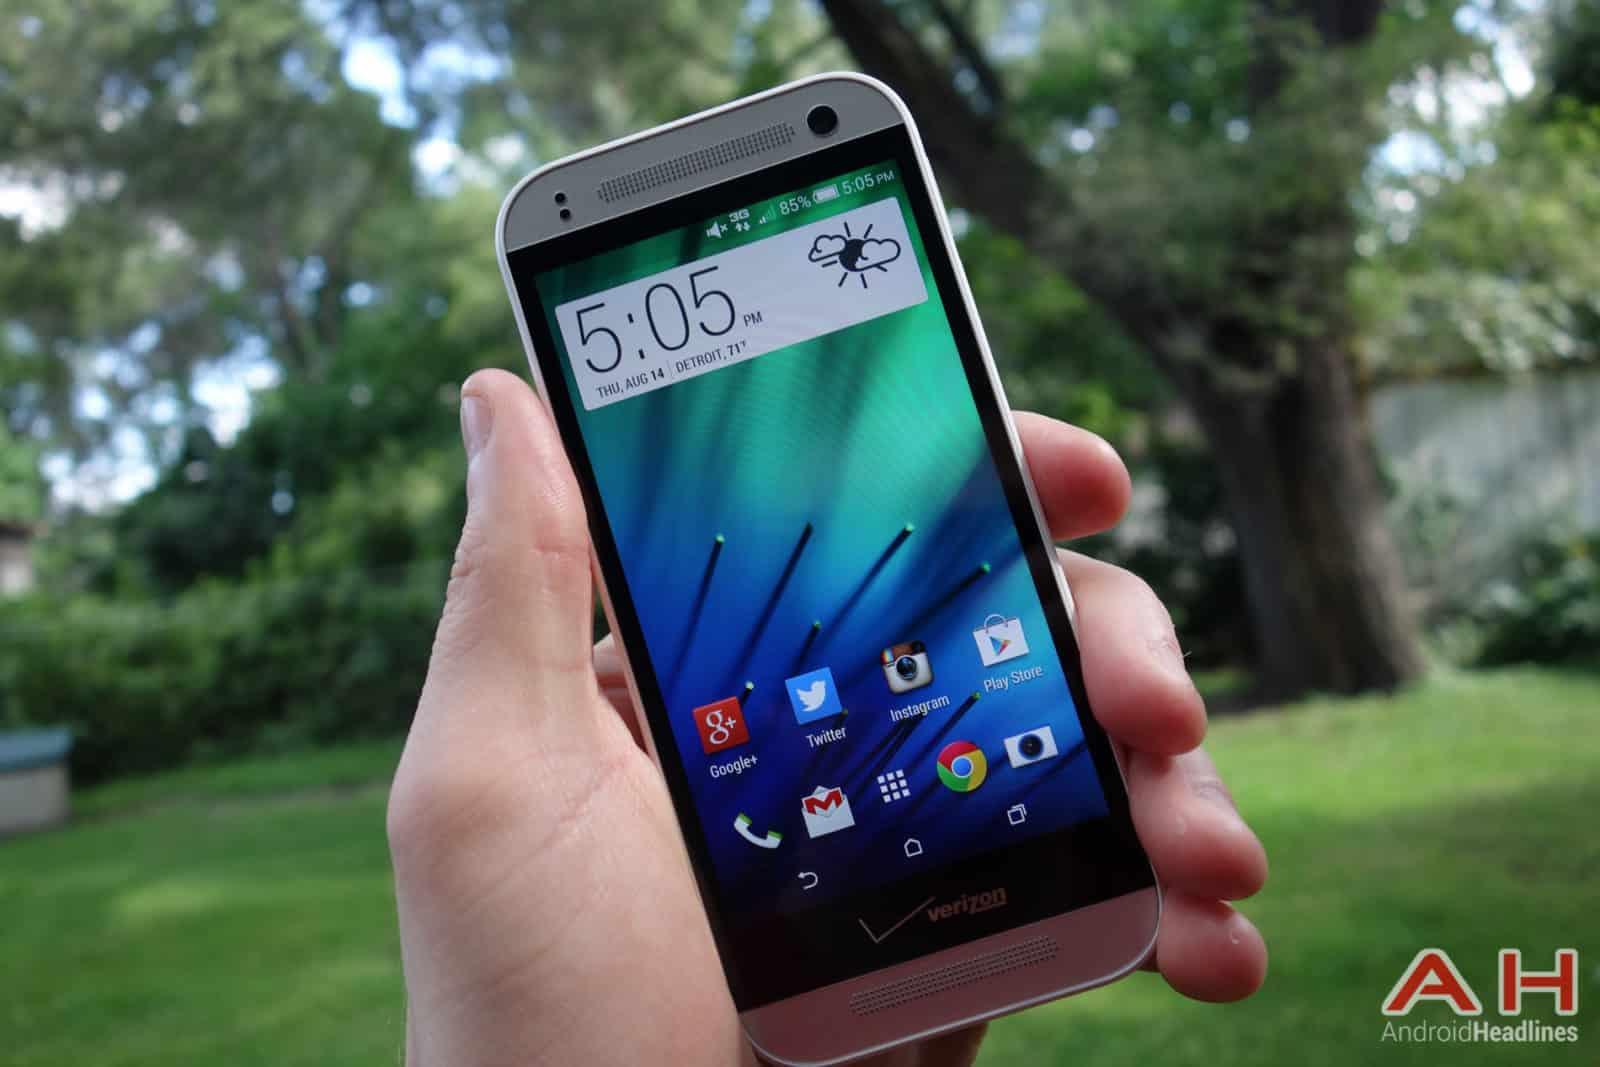 HTC-One-Remix-AH-11